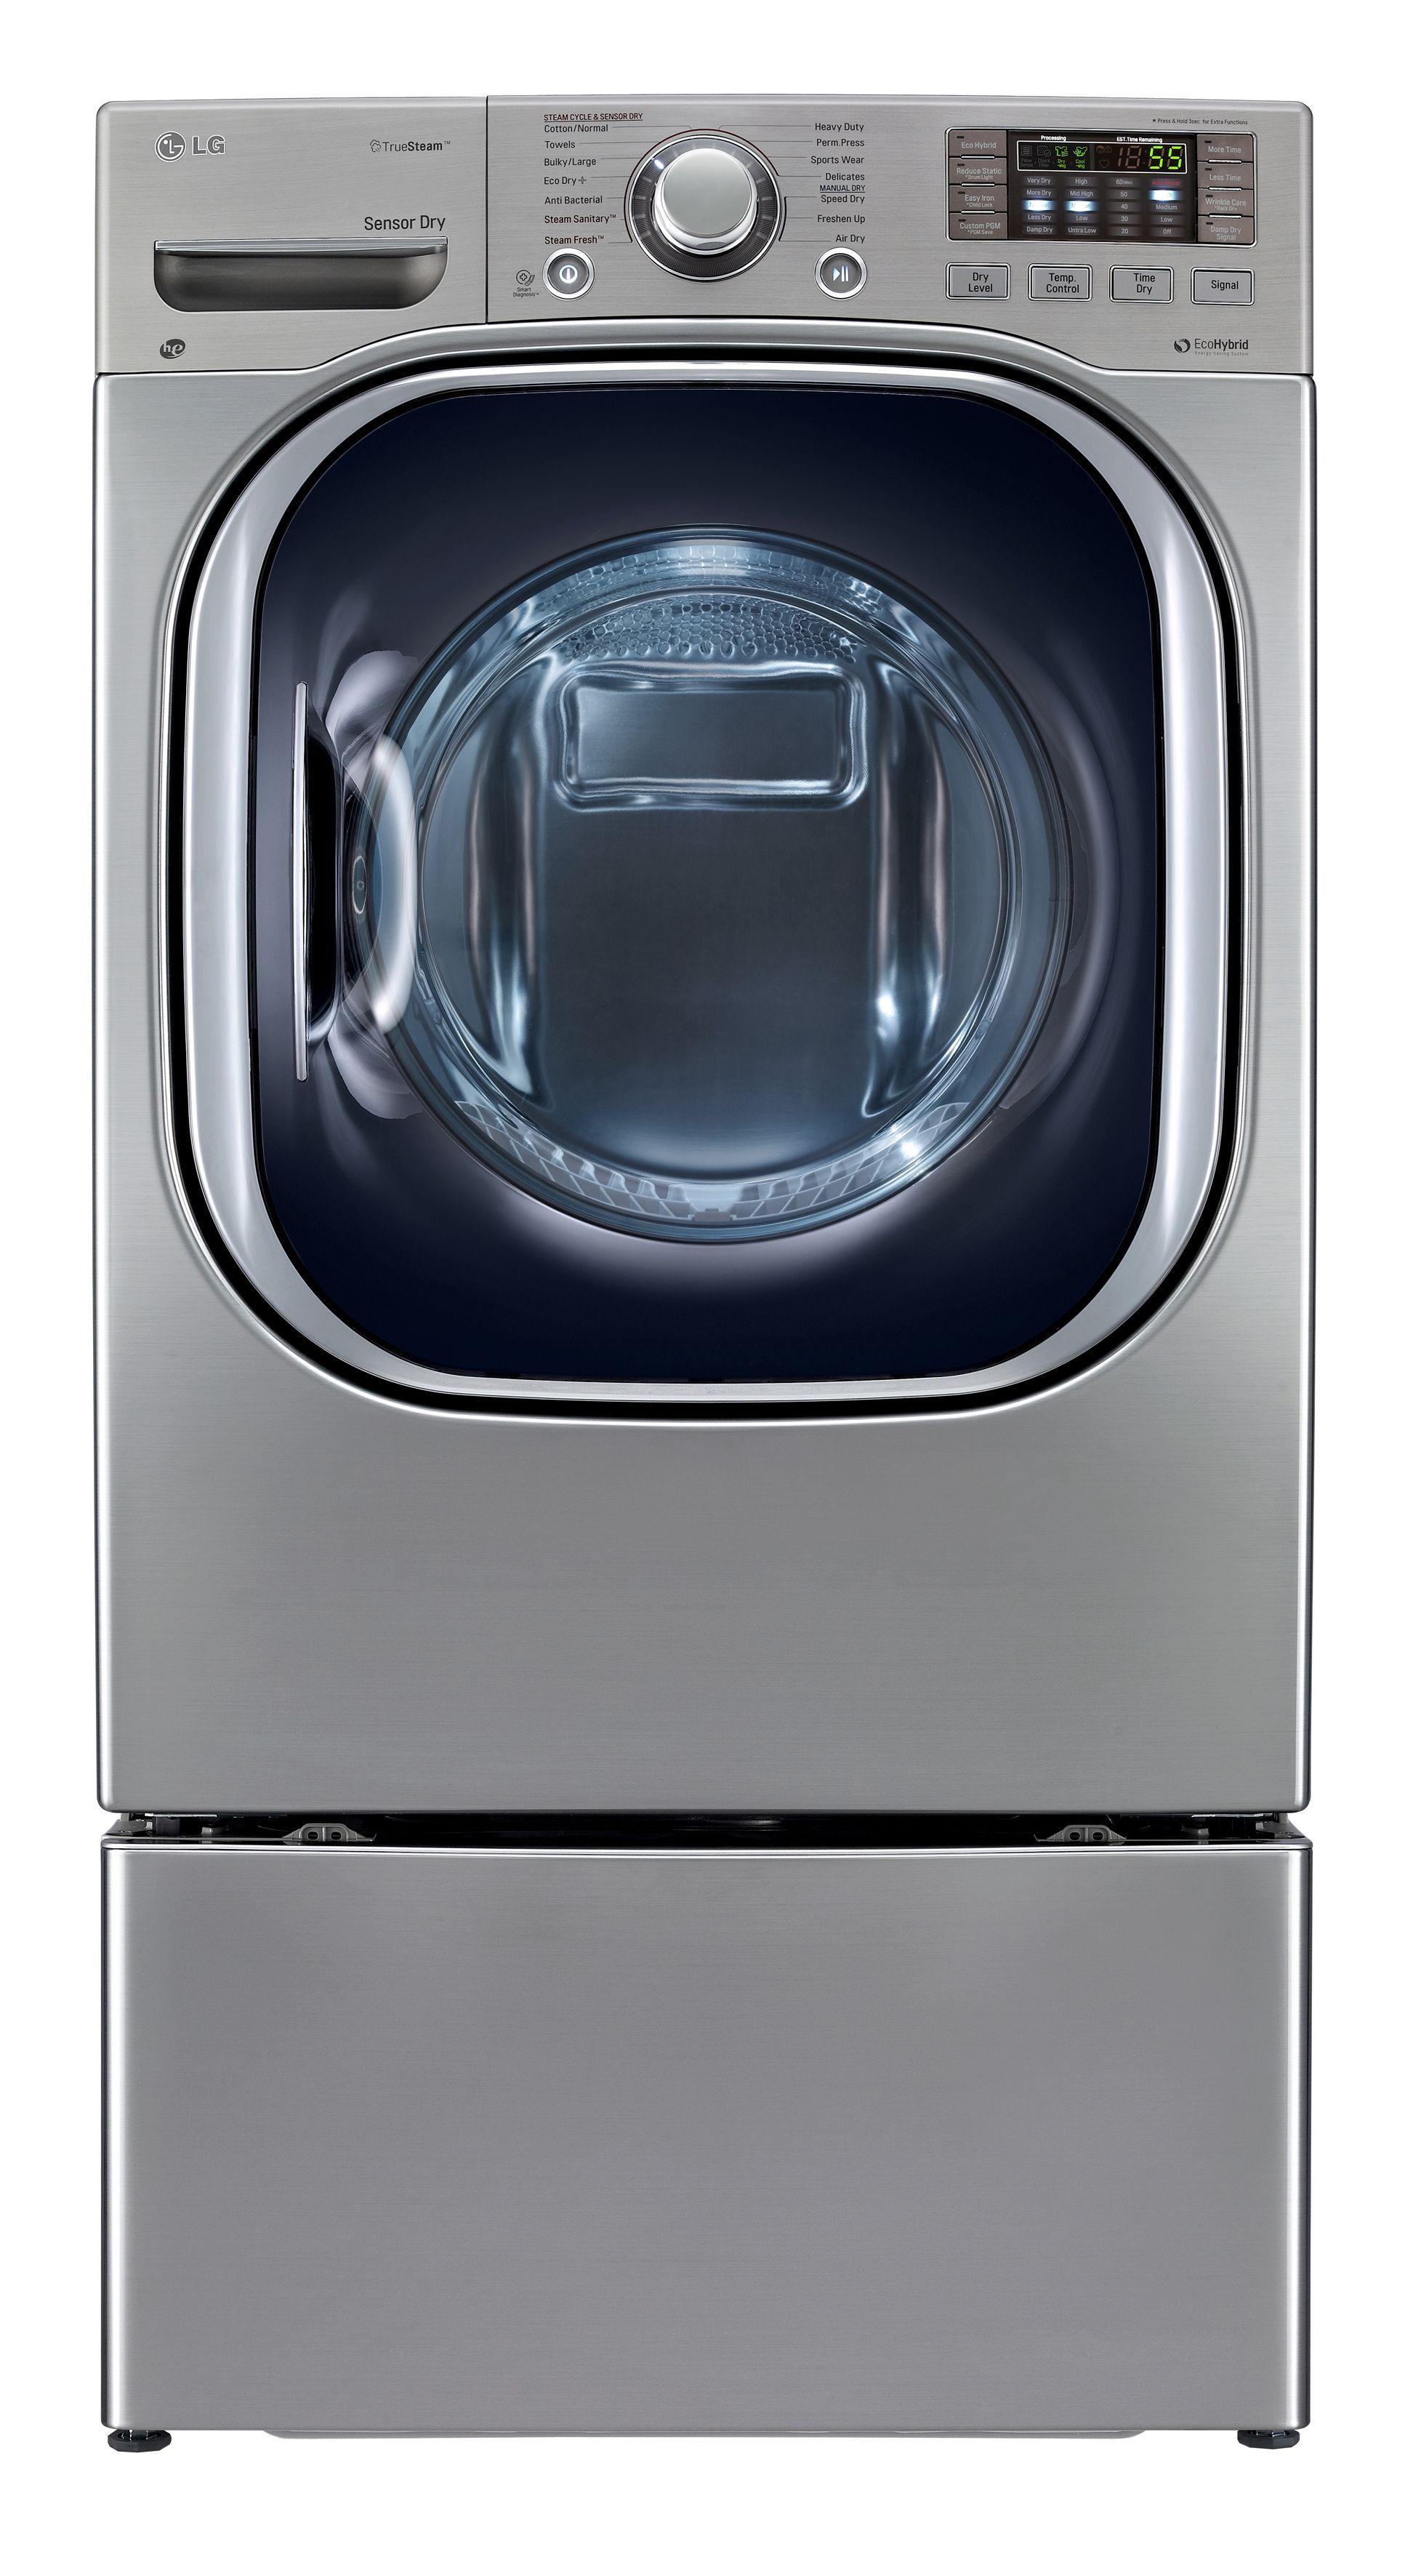 Lg Ecohybrid Heat Pump Dryer Earns 2014 Energy Star